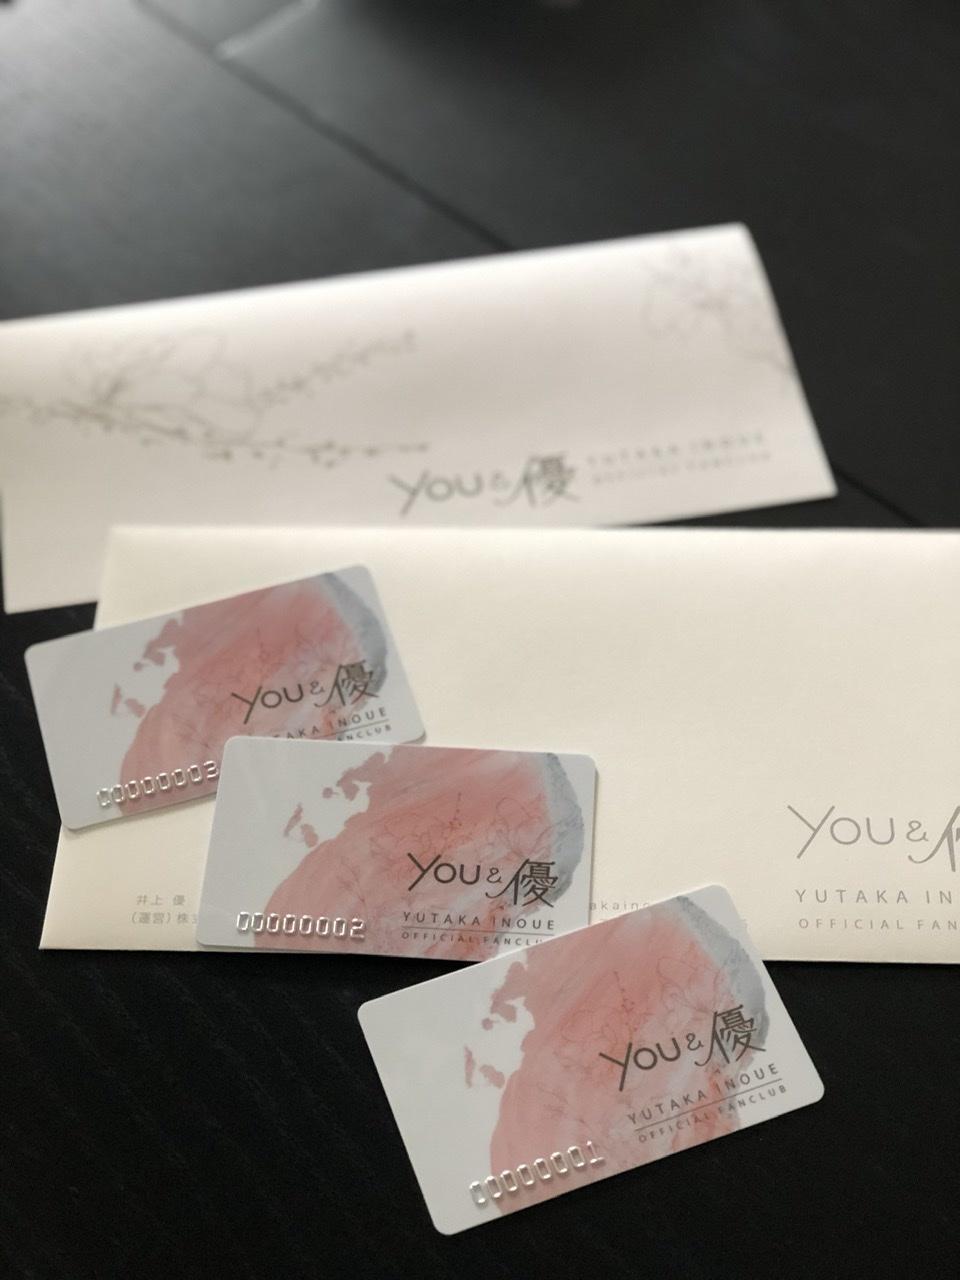 「YOU&優」「BLUE ROSE」オフィシャルファンクラブ会員証完成しました!_a0157409_14013712.jpeg